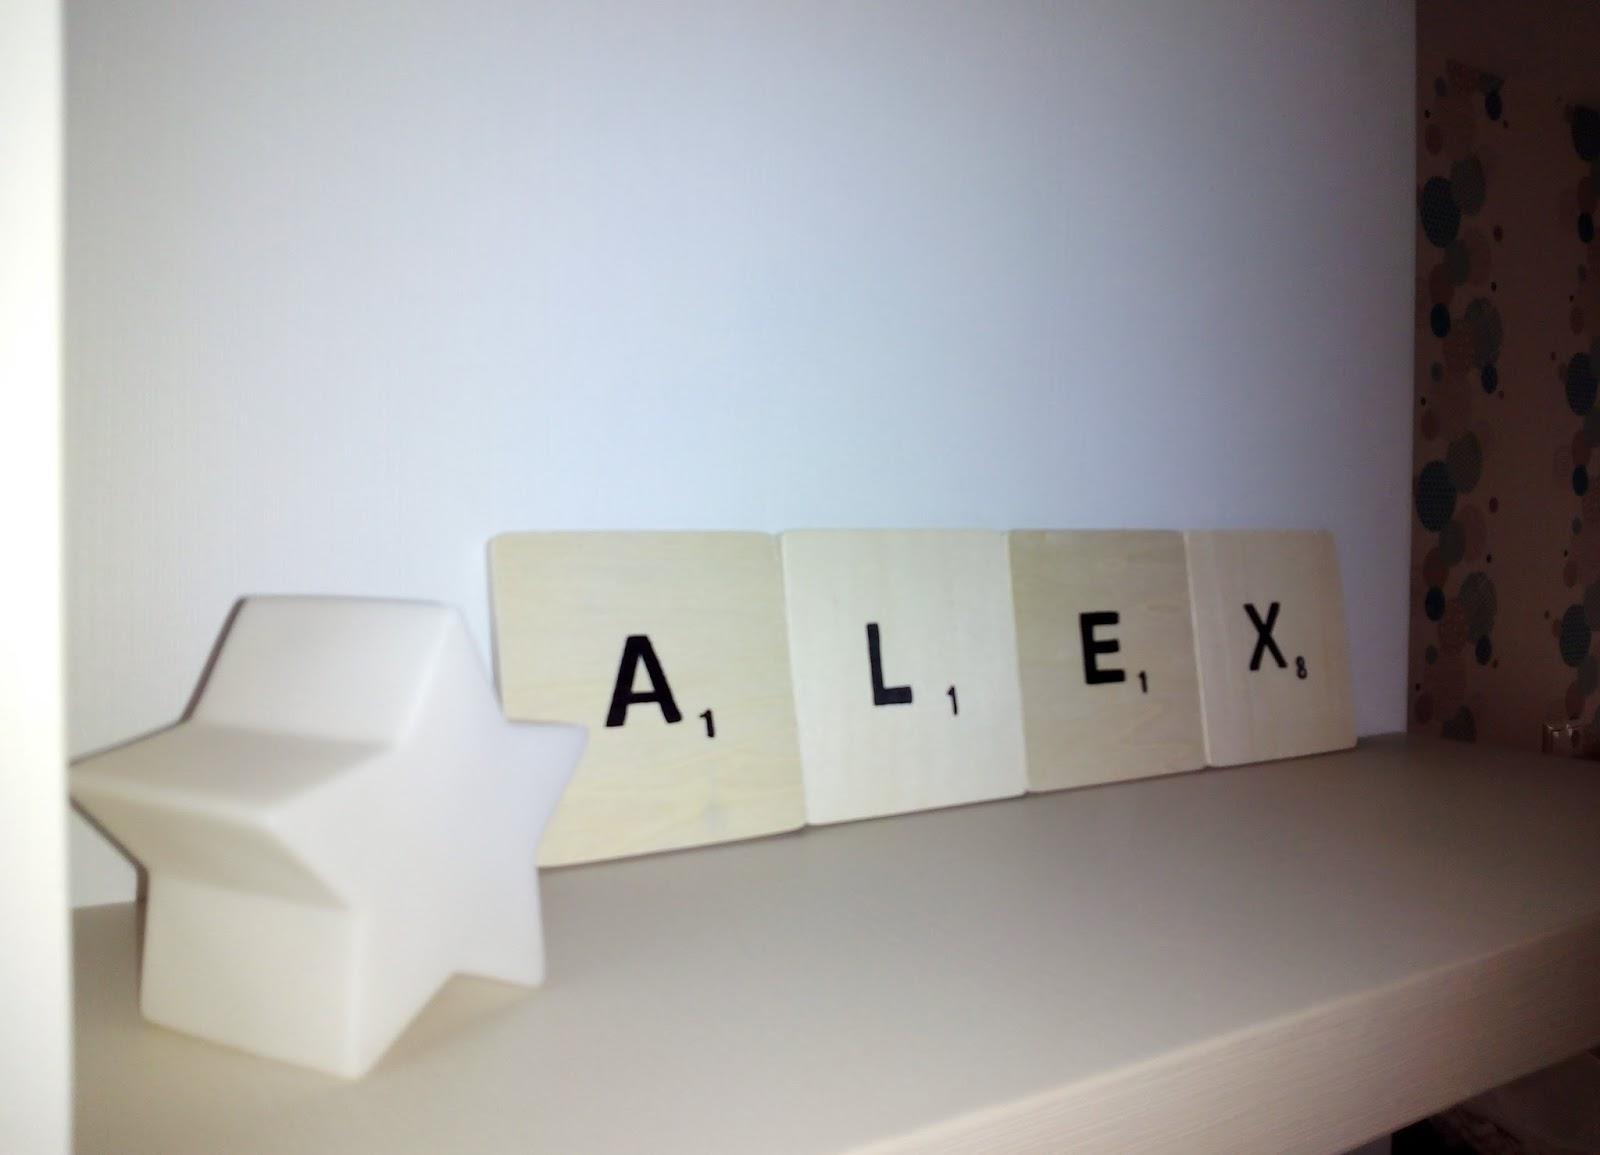 I d e a la habitaci n de lex parte 4 letras scrabble - Letras scrabble pared ...